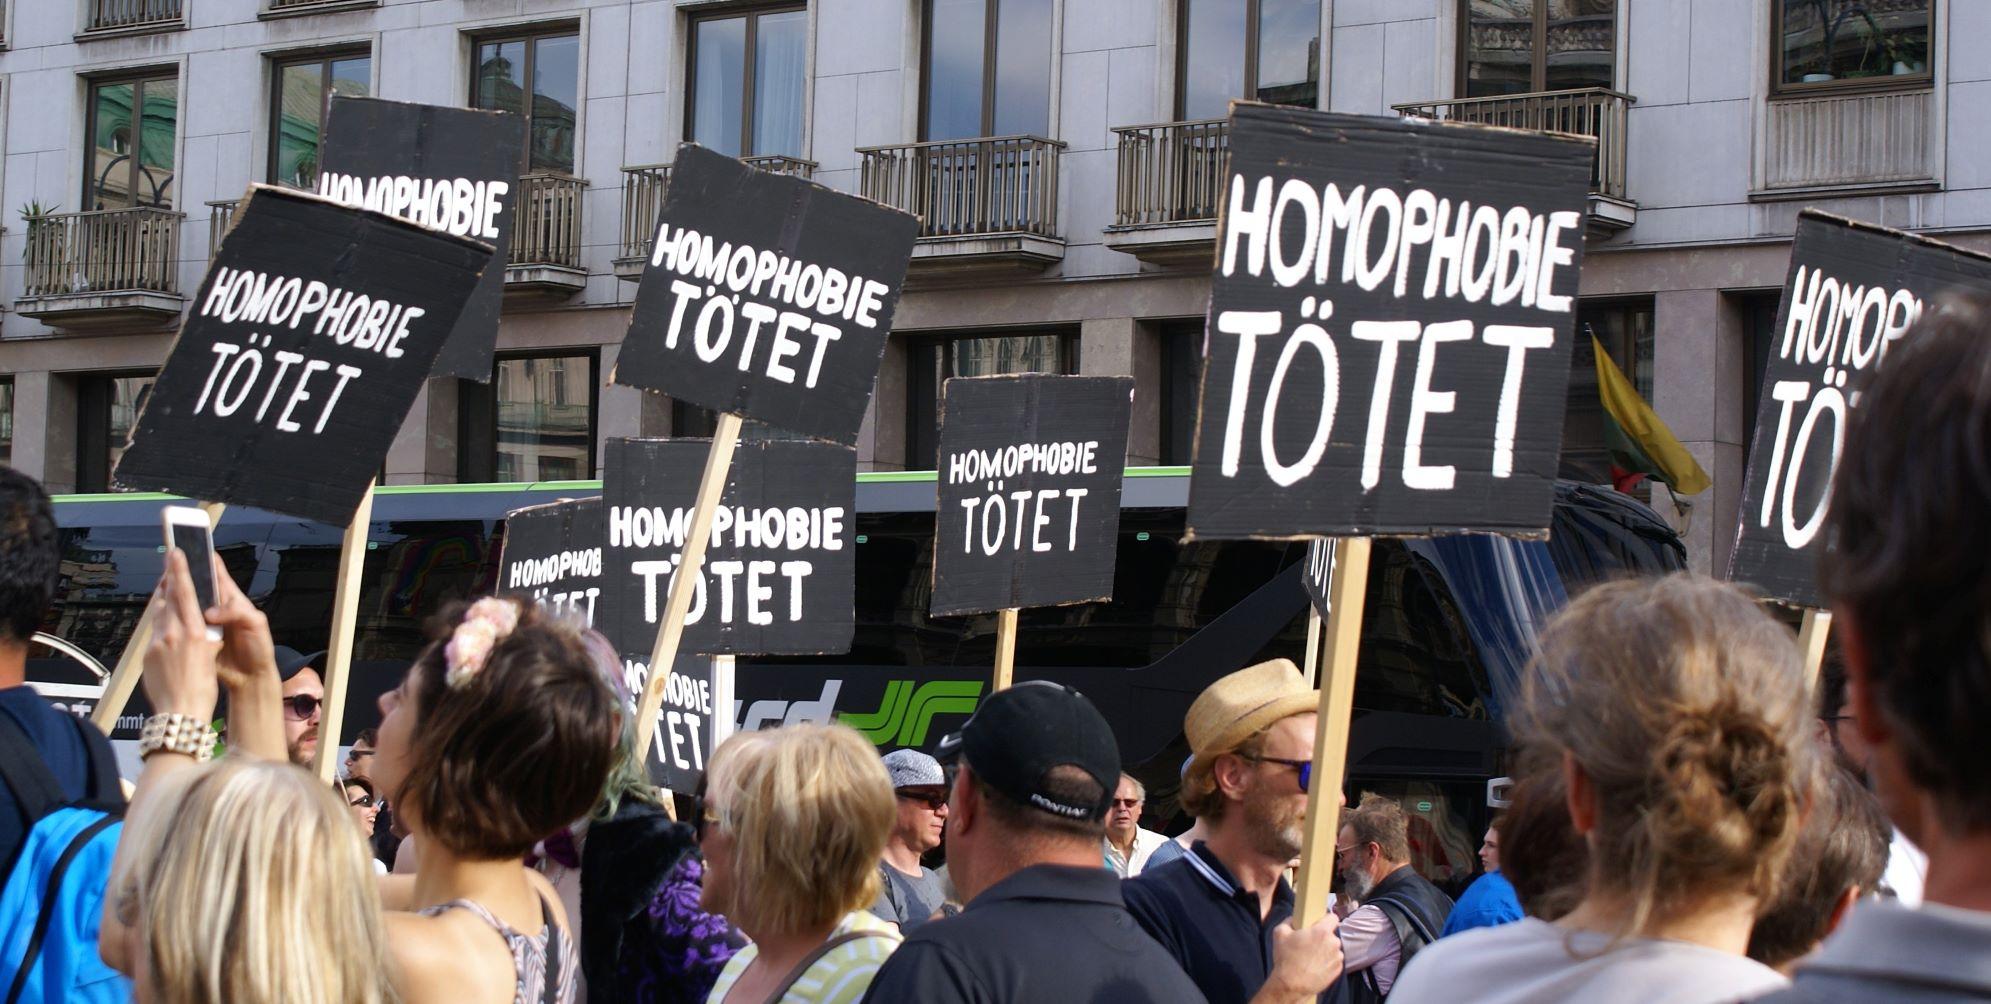 Homophobie tötet_web.jpg